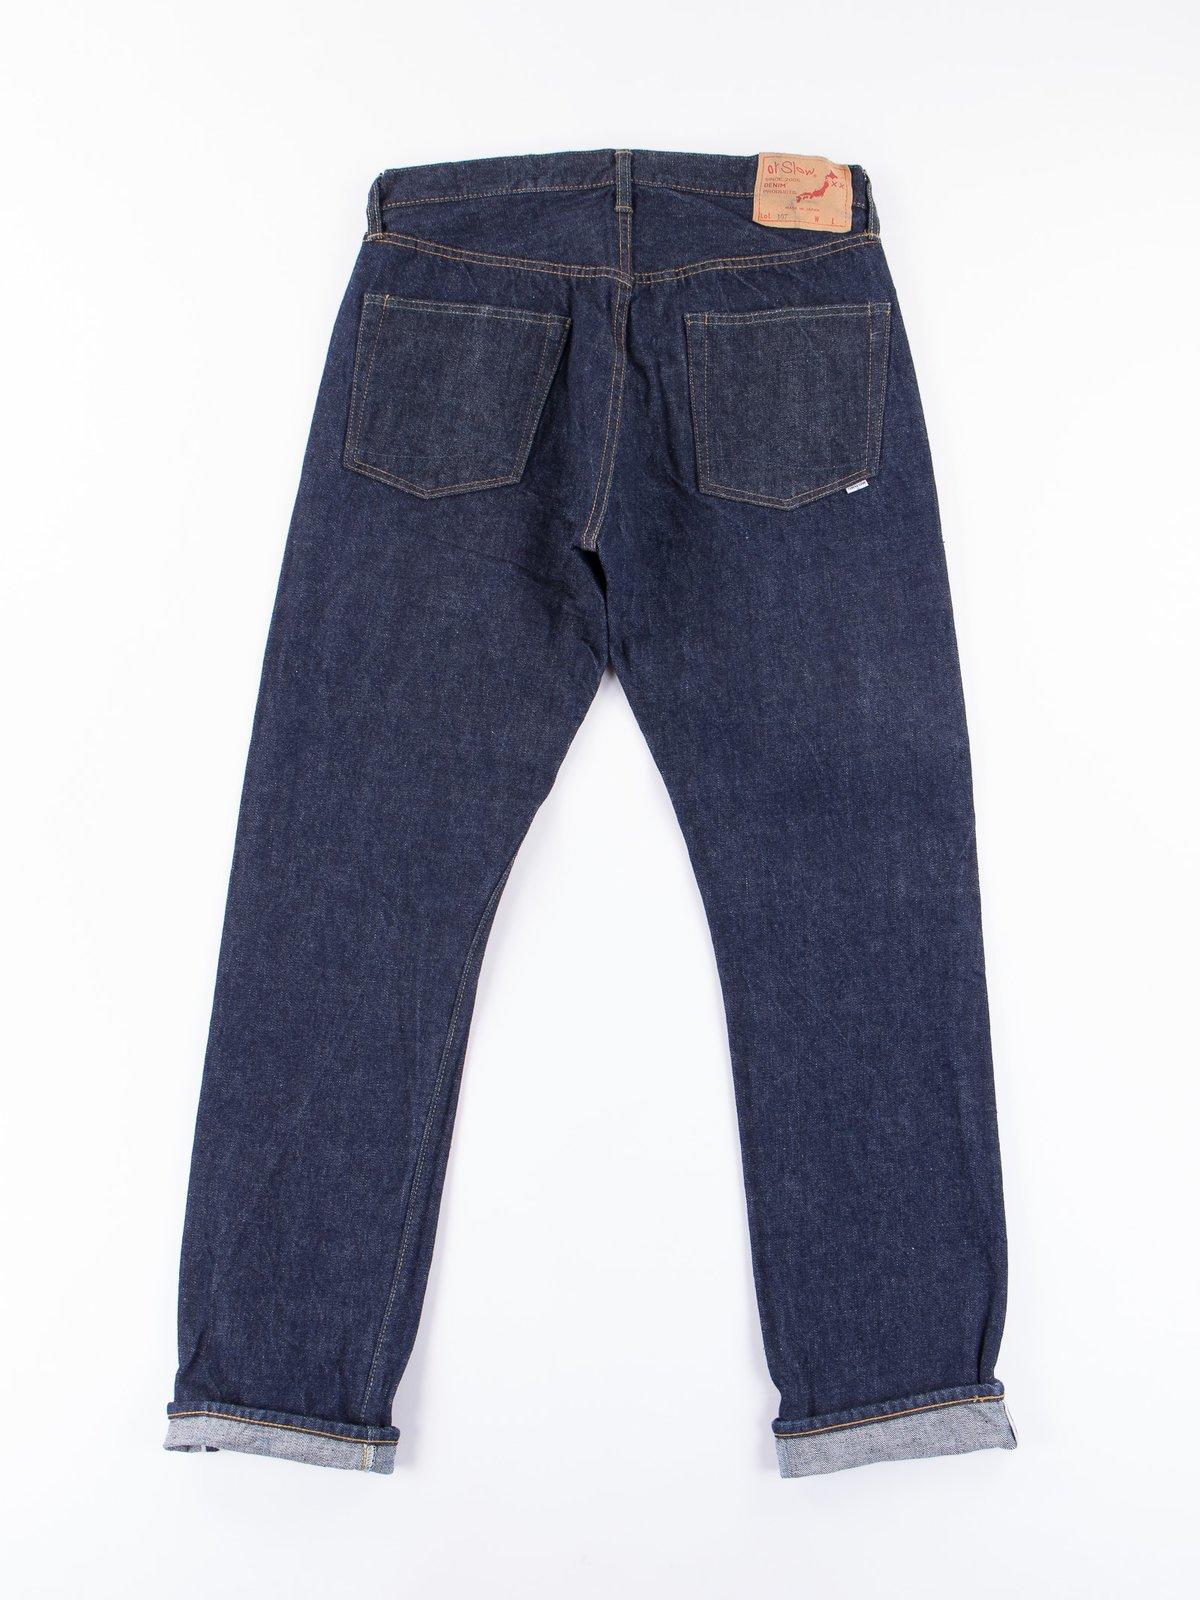 One Wash 107 Slim Fit Jean - Image 7